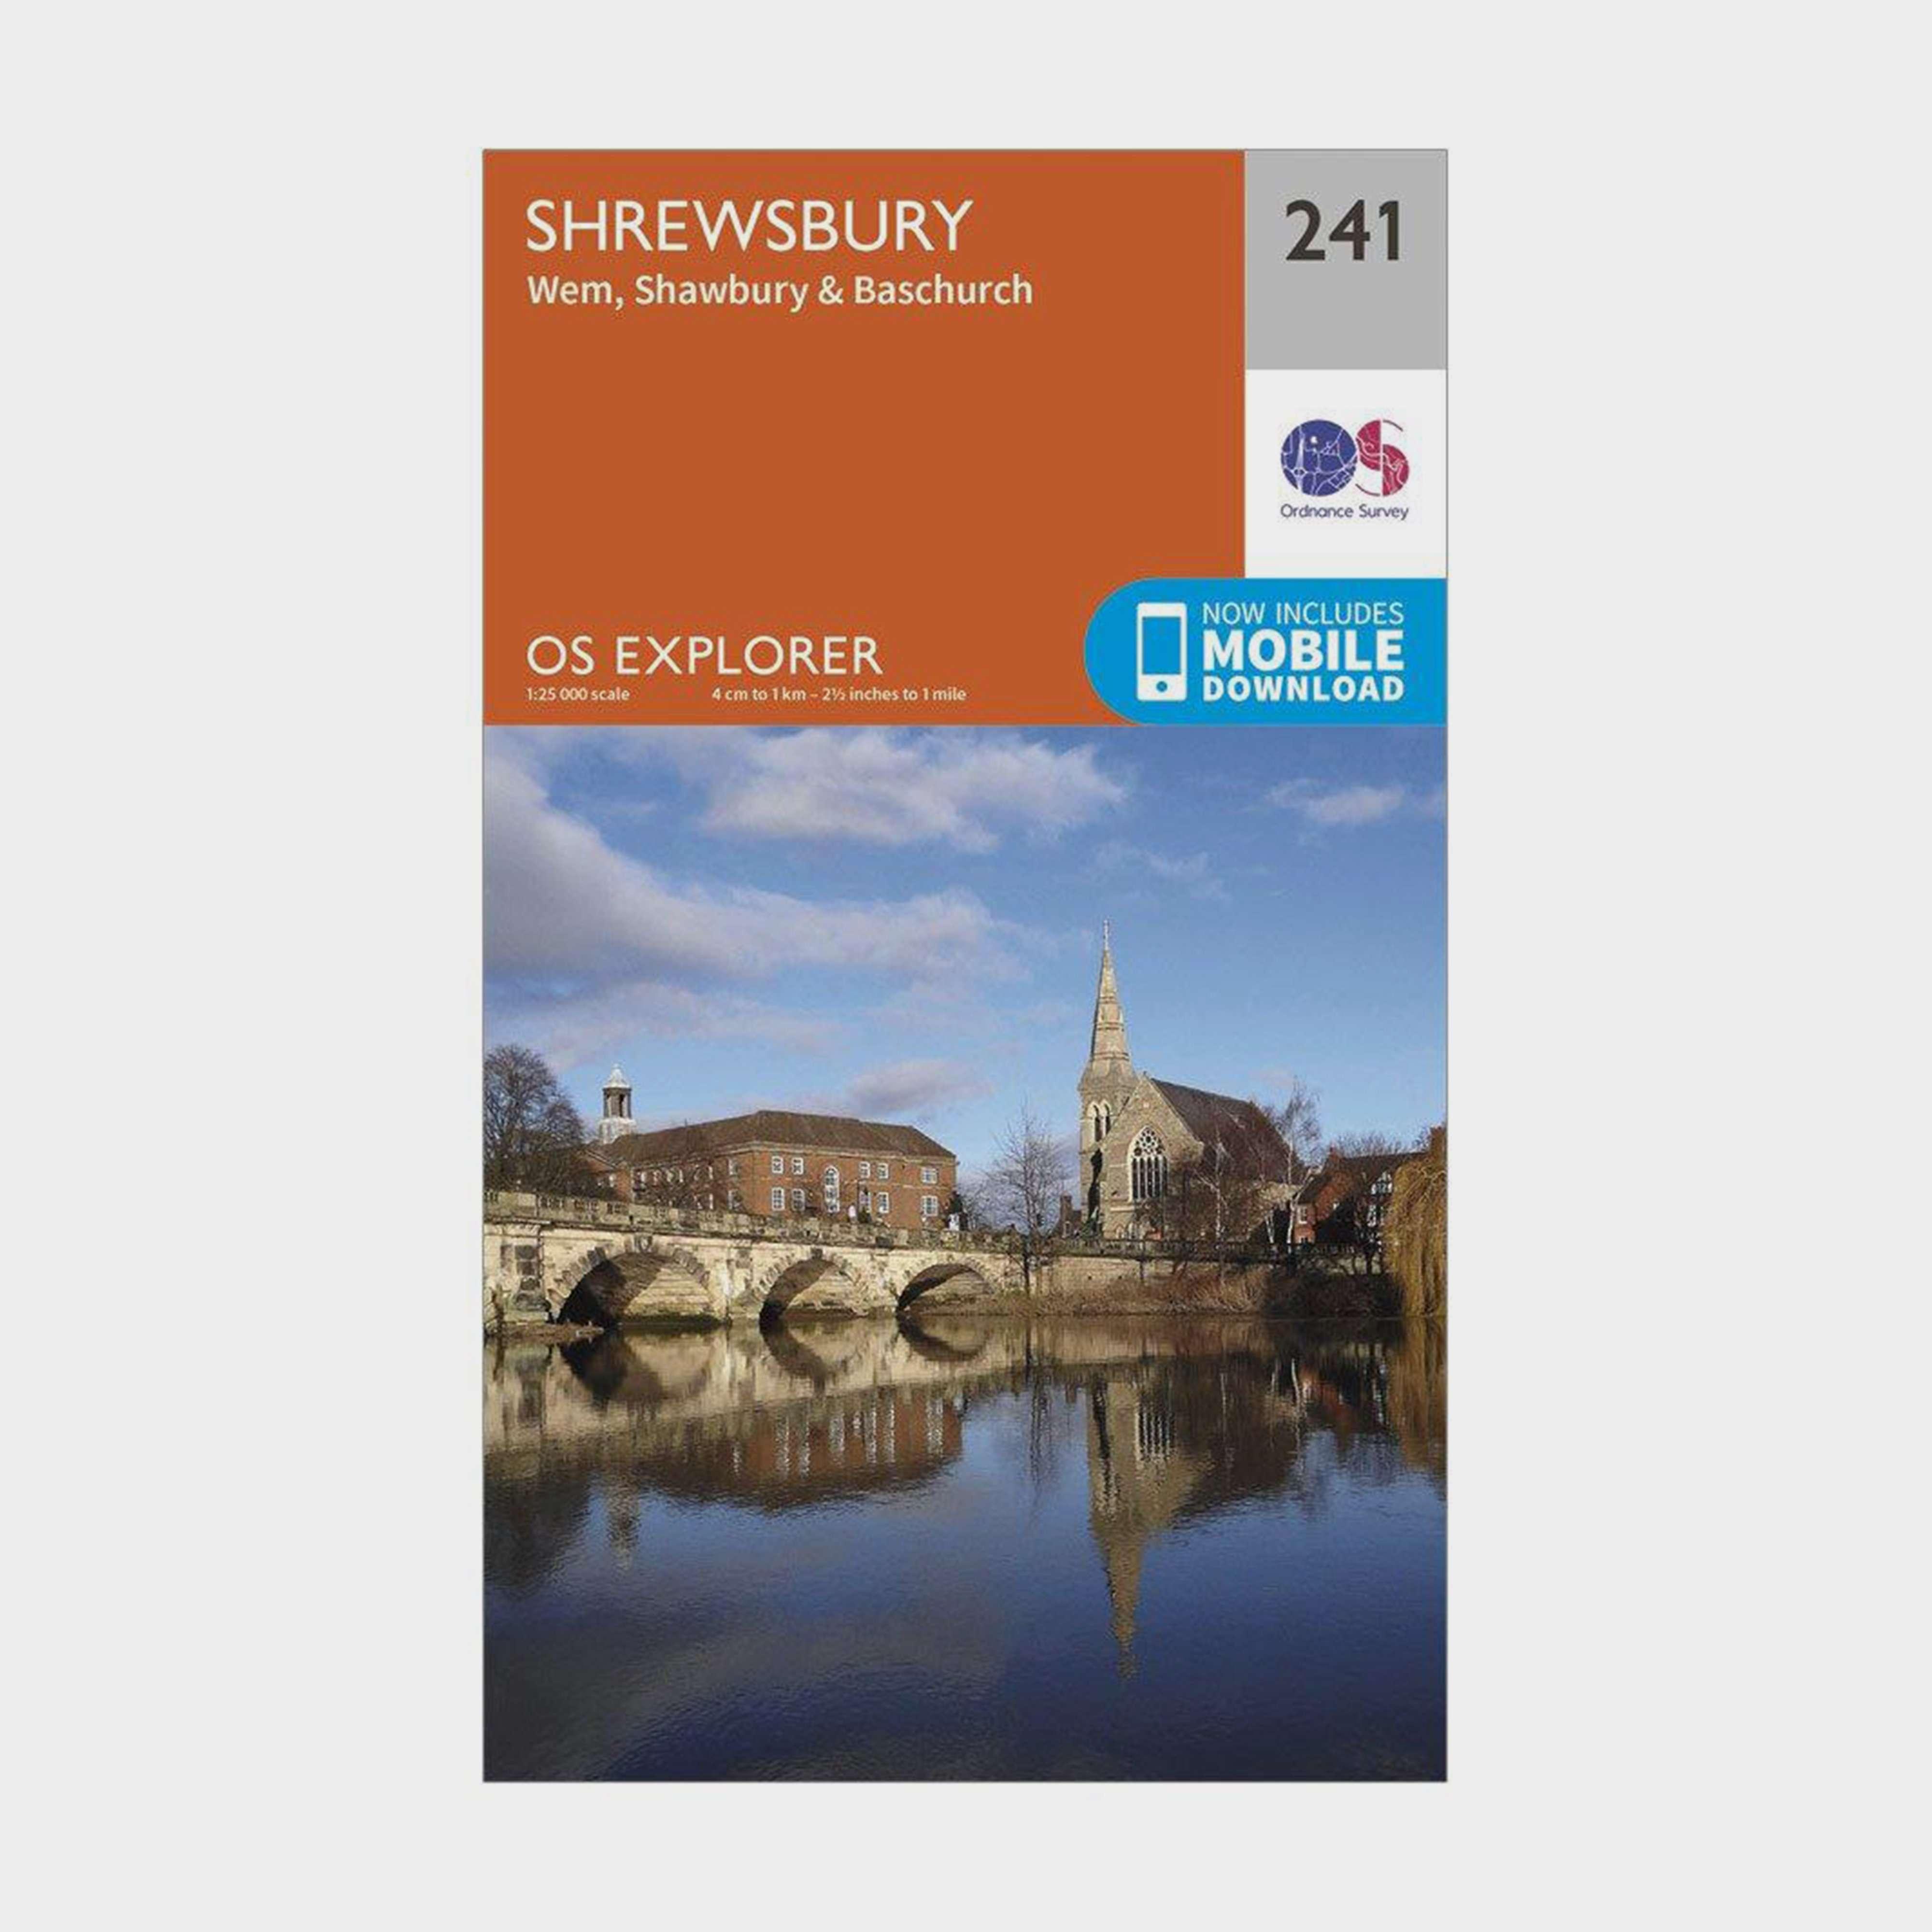 ORDNANCE SURVEY Explorer 241 Shrewsbury, Wem, Shawbury & Baschurch Map With Digital Version